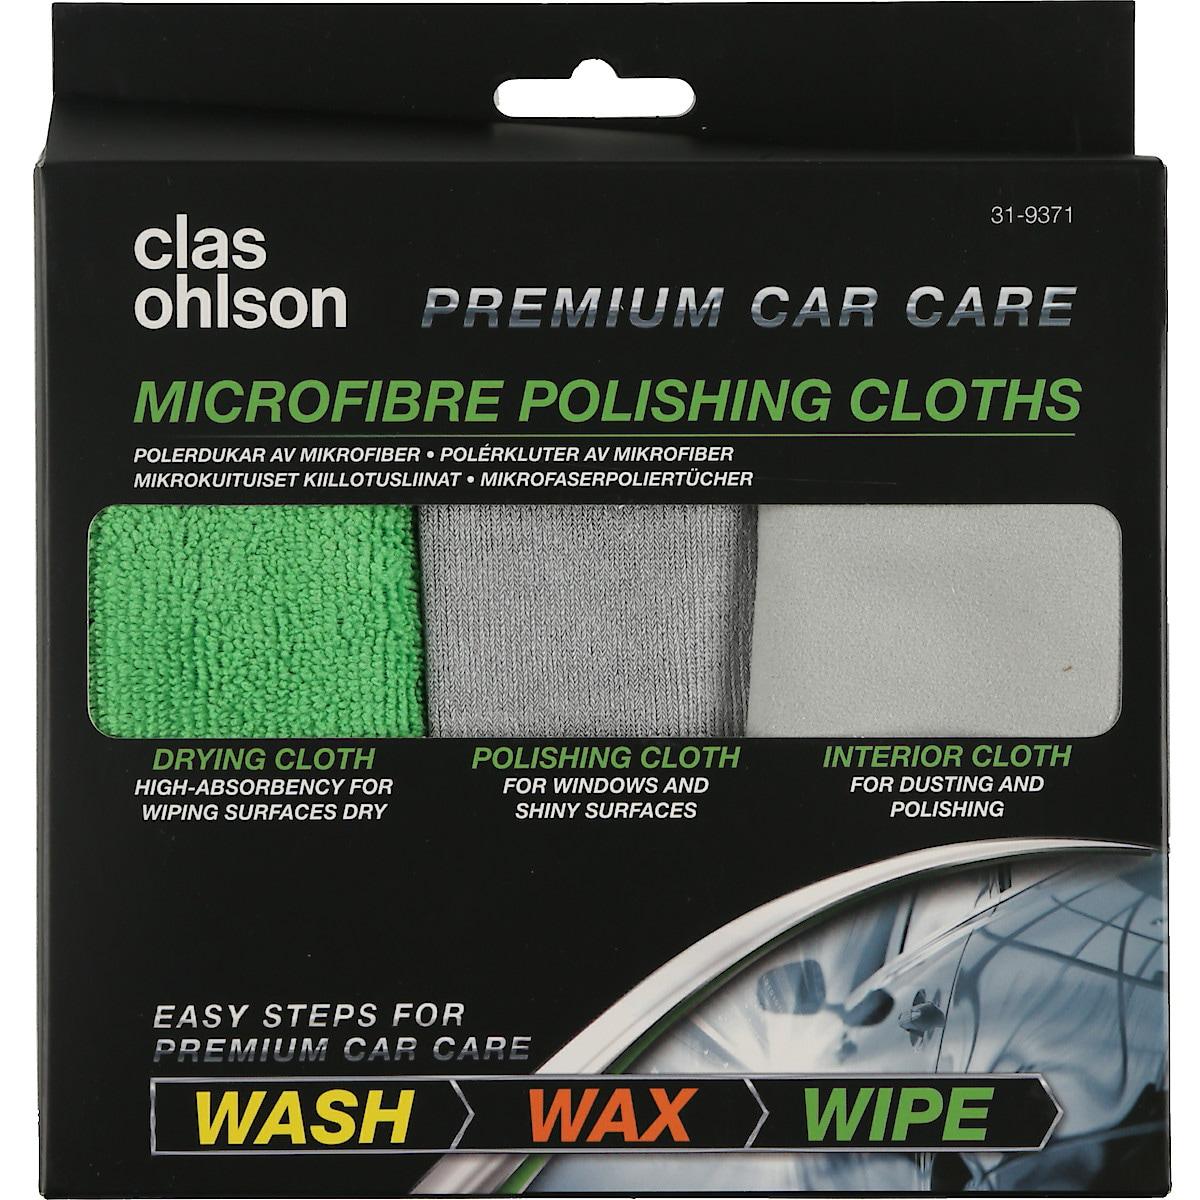 Set of 3 Microfibre Polishing Cloths